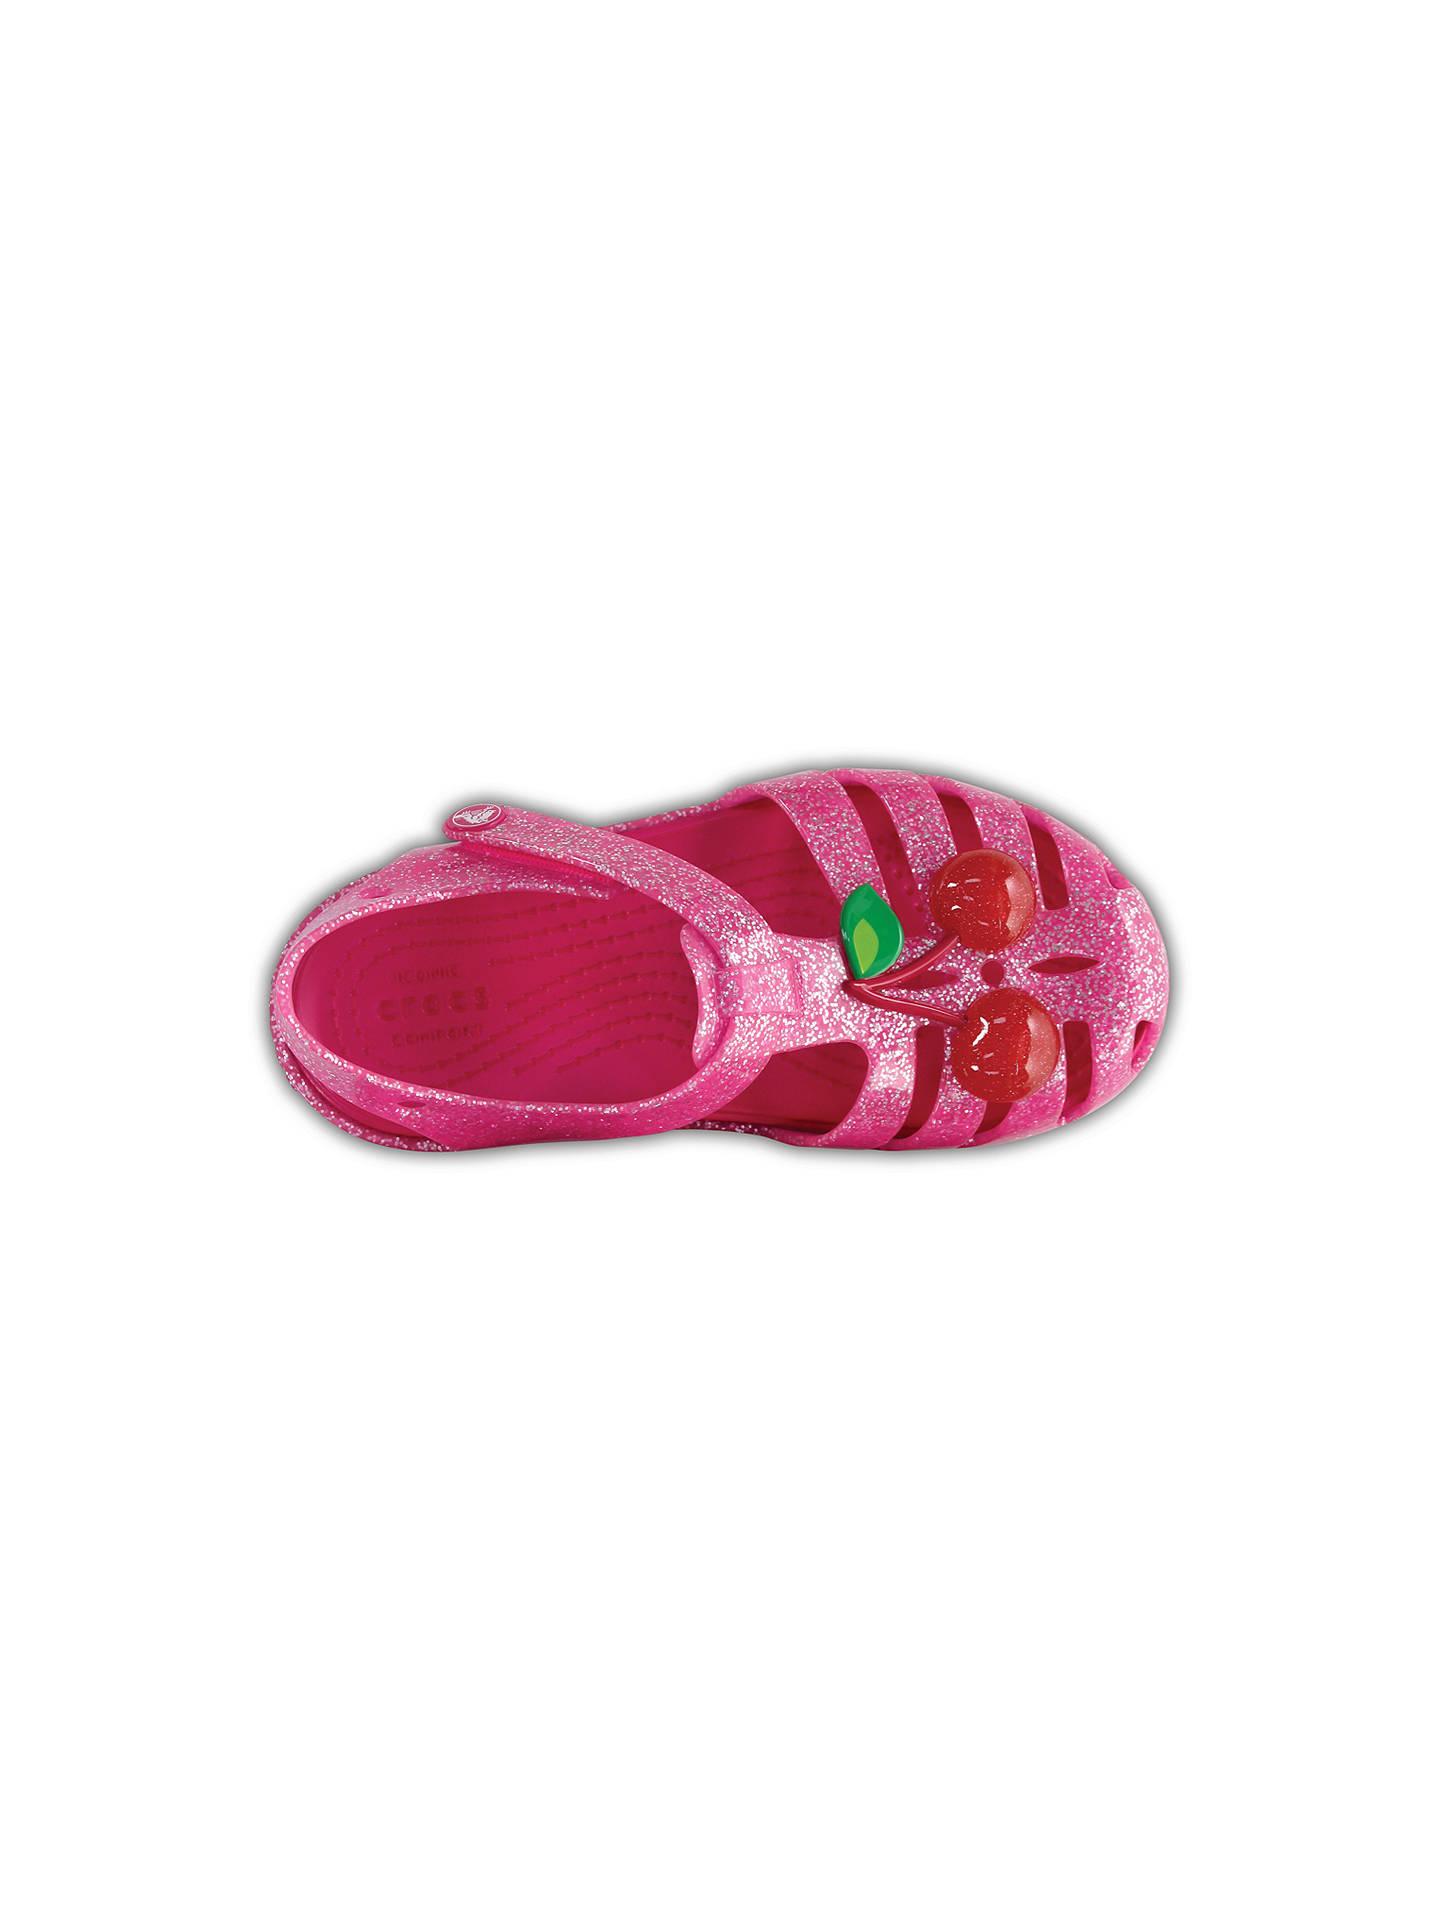 12a955f1 ... Buy Crocs Children's Isabella Novelty Sandals, Cherry, 4 Jnr Online at  johnlewis. ...